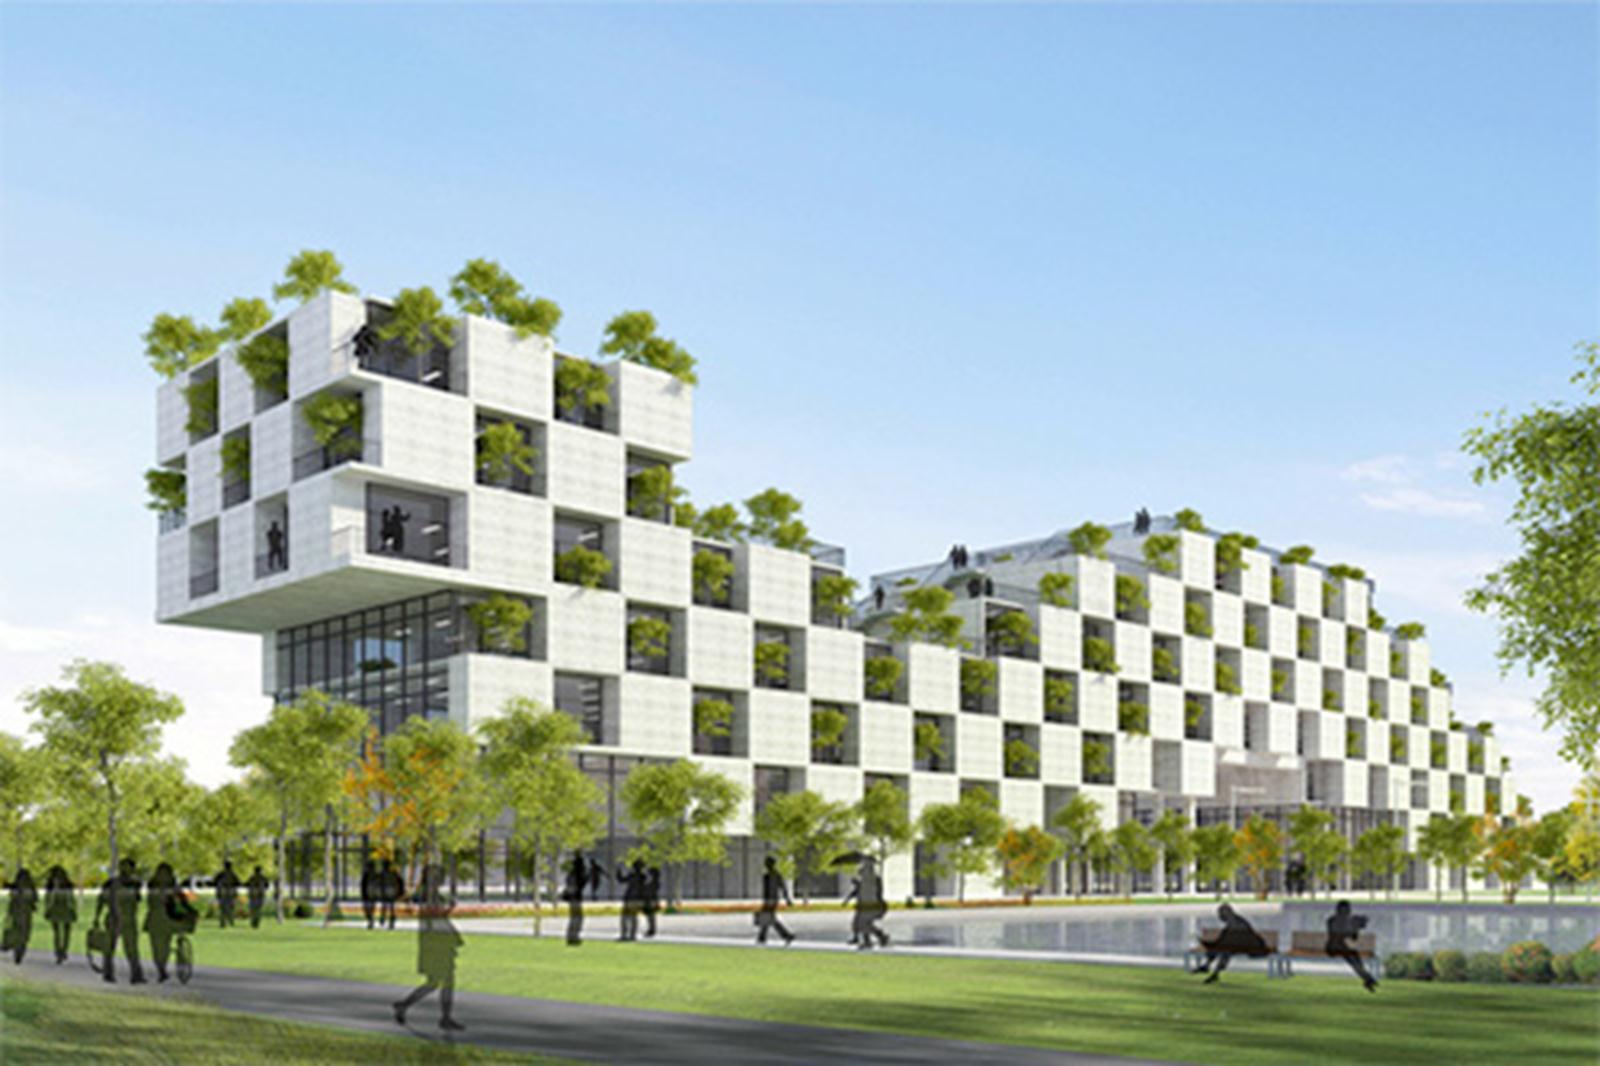 Đại học FPT / Vo Trong Nghia Architects